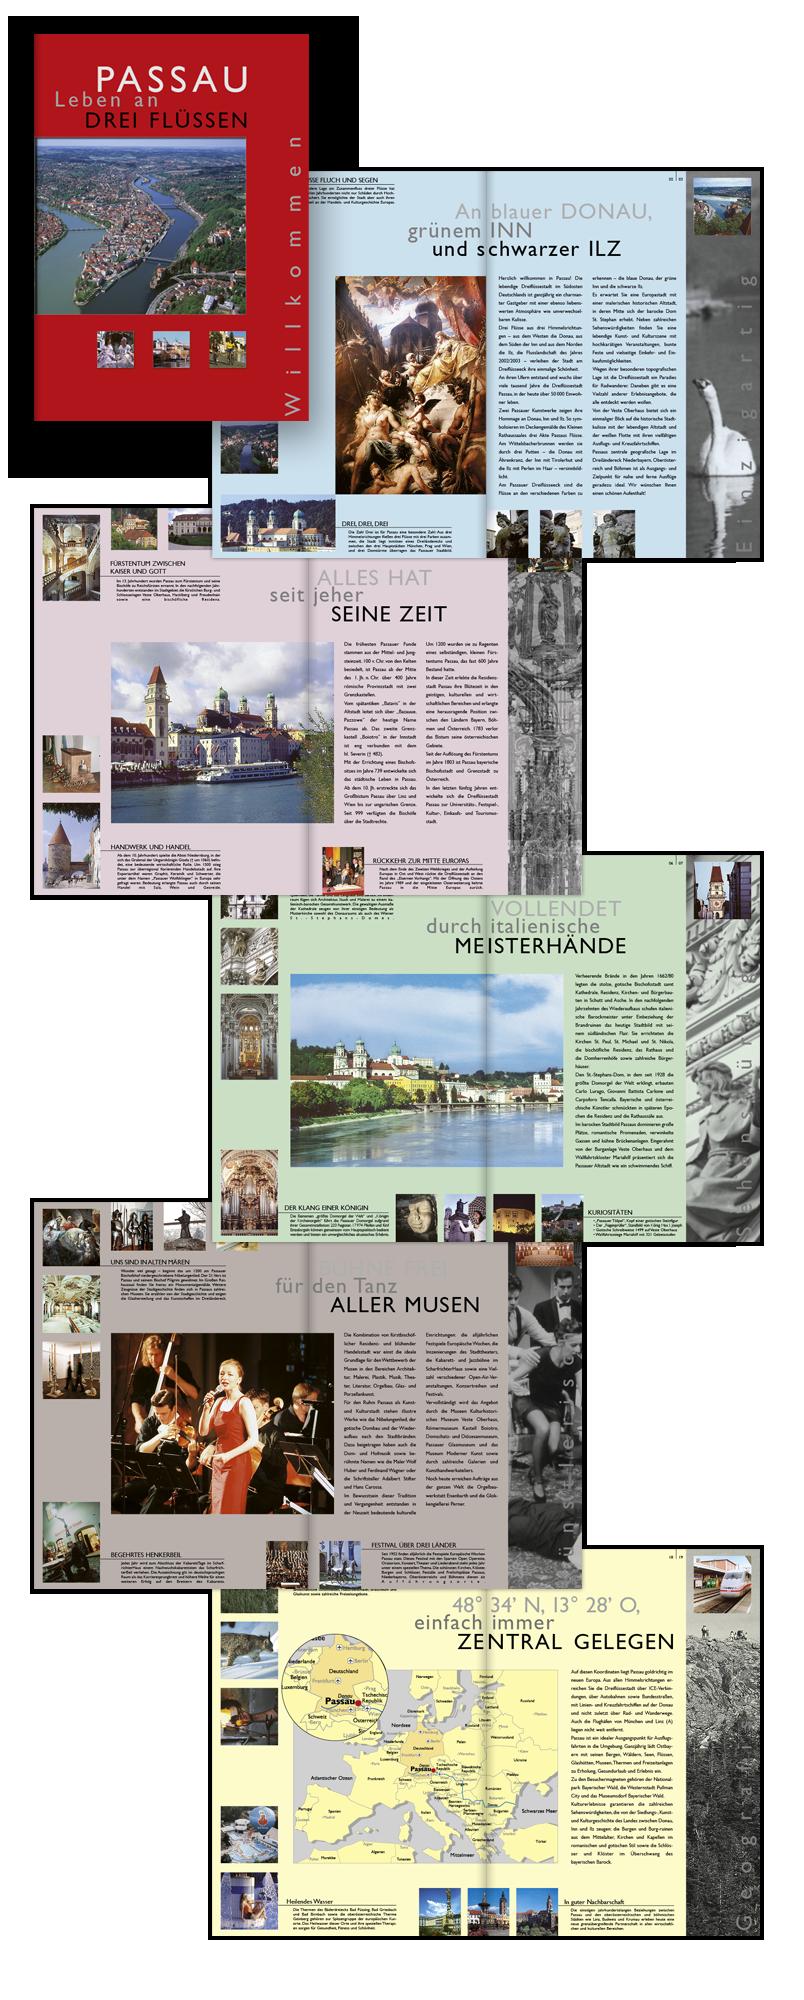 Passau Tourismus / Imagebroschüre